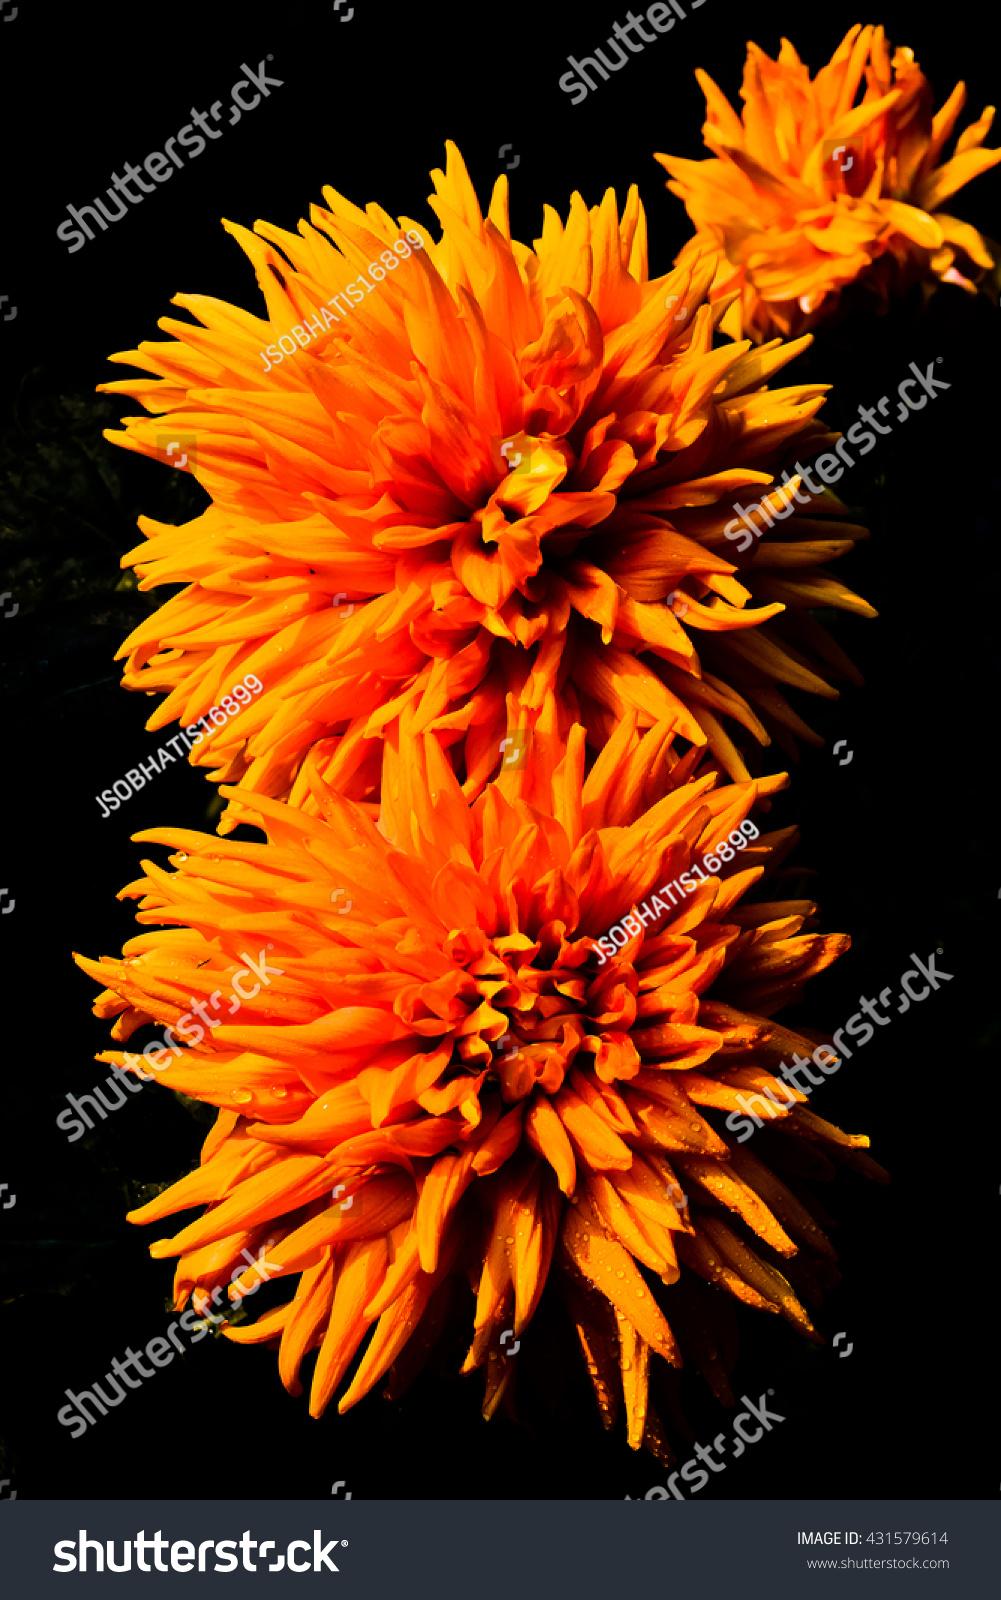 Chrysanthemum one most beautiful flower there stock photo royalty chrysanthemum is one of the most beautiful flower there are many kinds types or izmirmasajfo